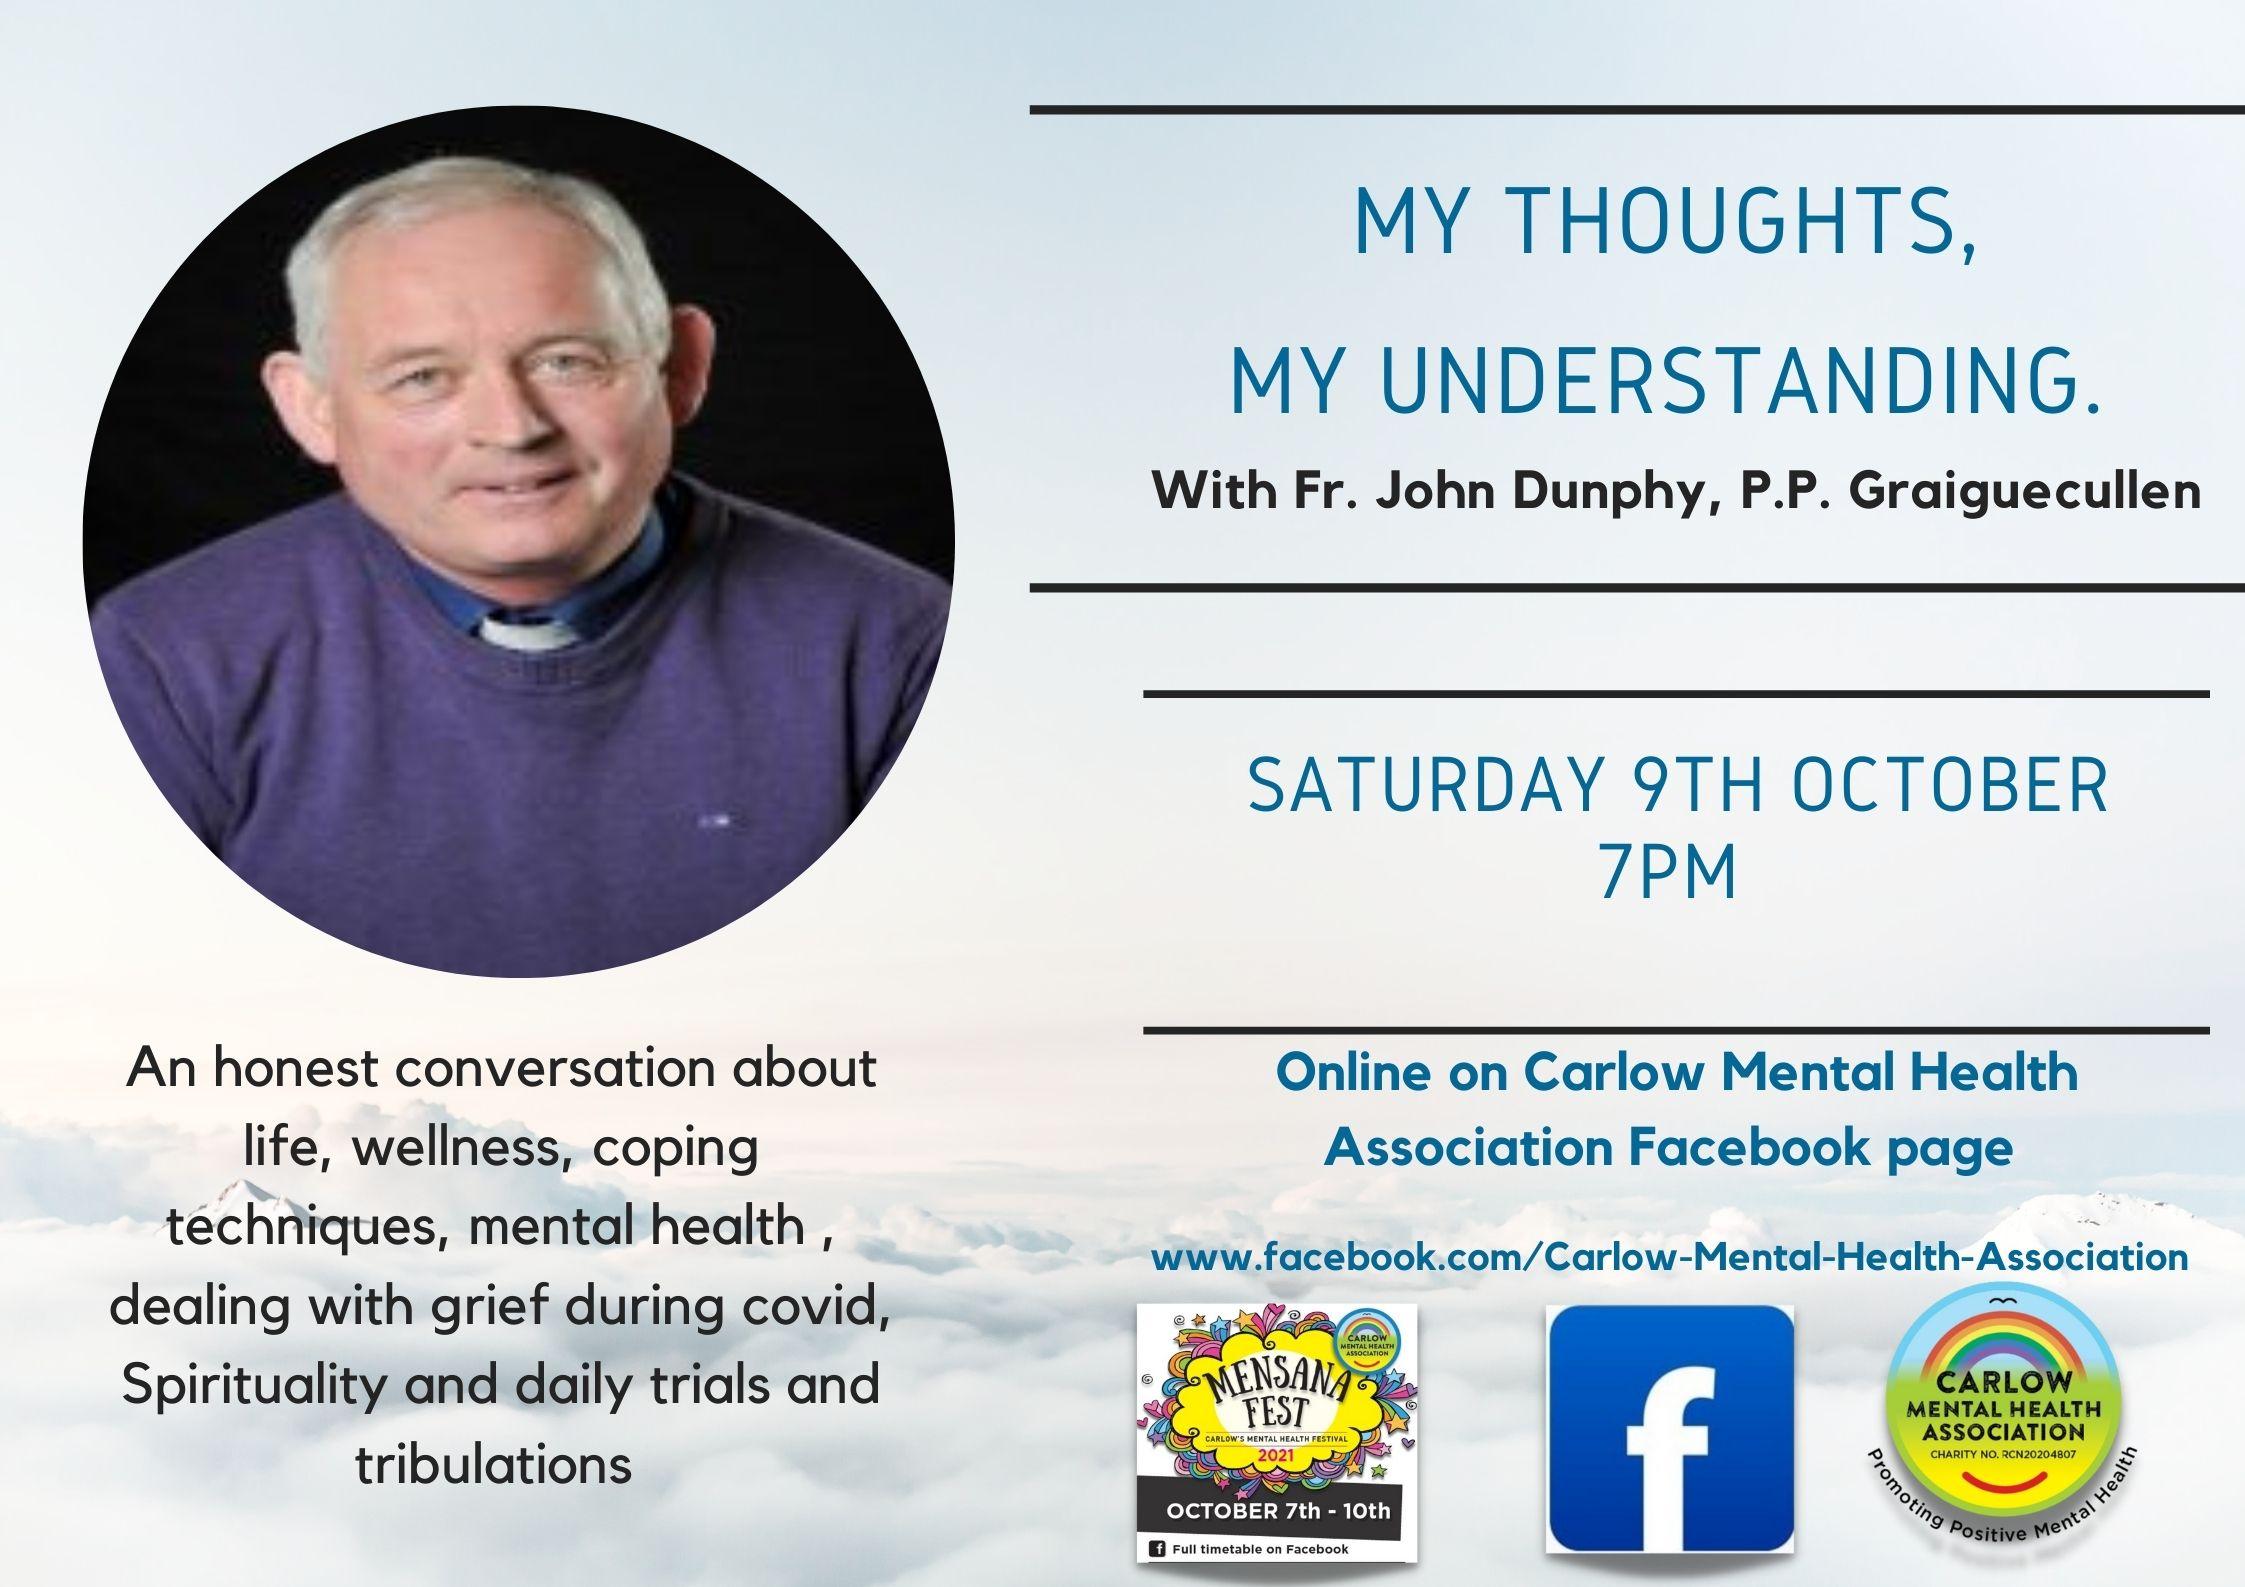 My Thoughts, My understanding, Fr. John Dunphy